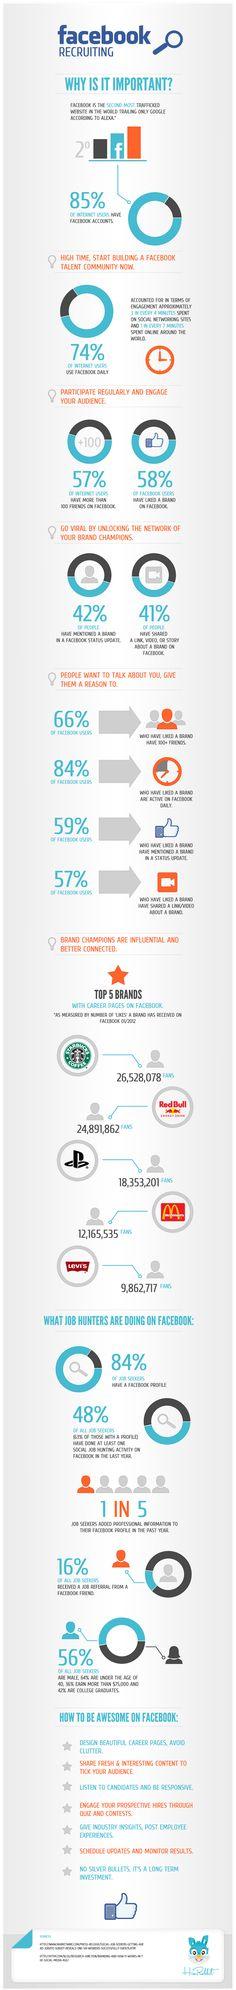 Facebook Recruiting #infographic #Facebook #Recruiting